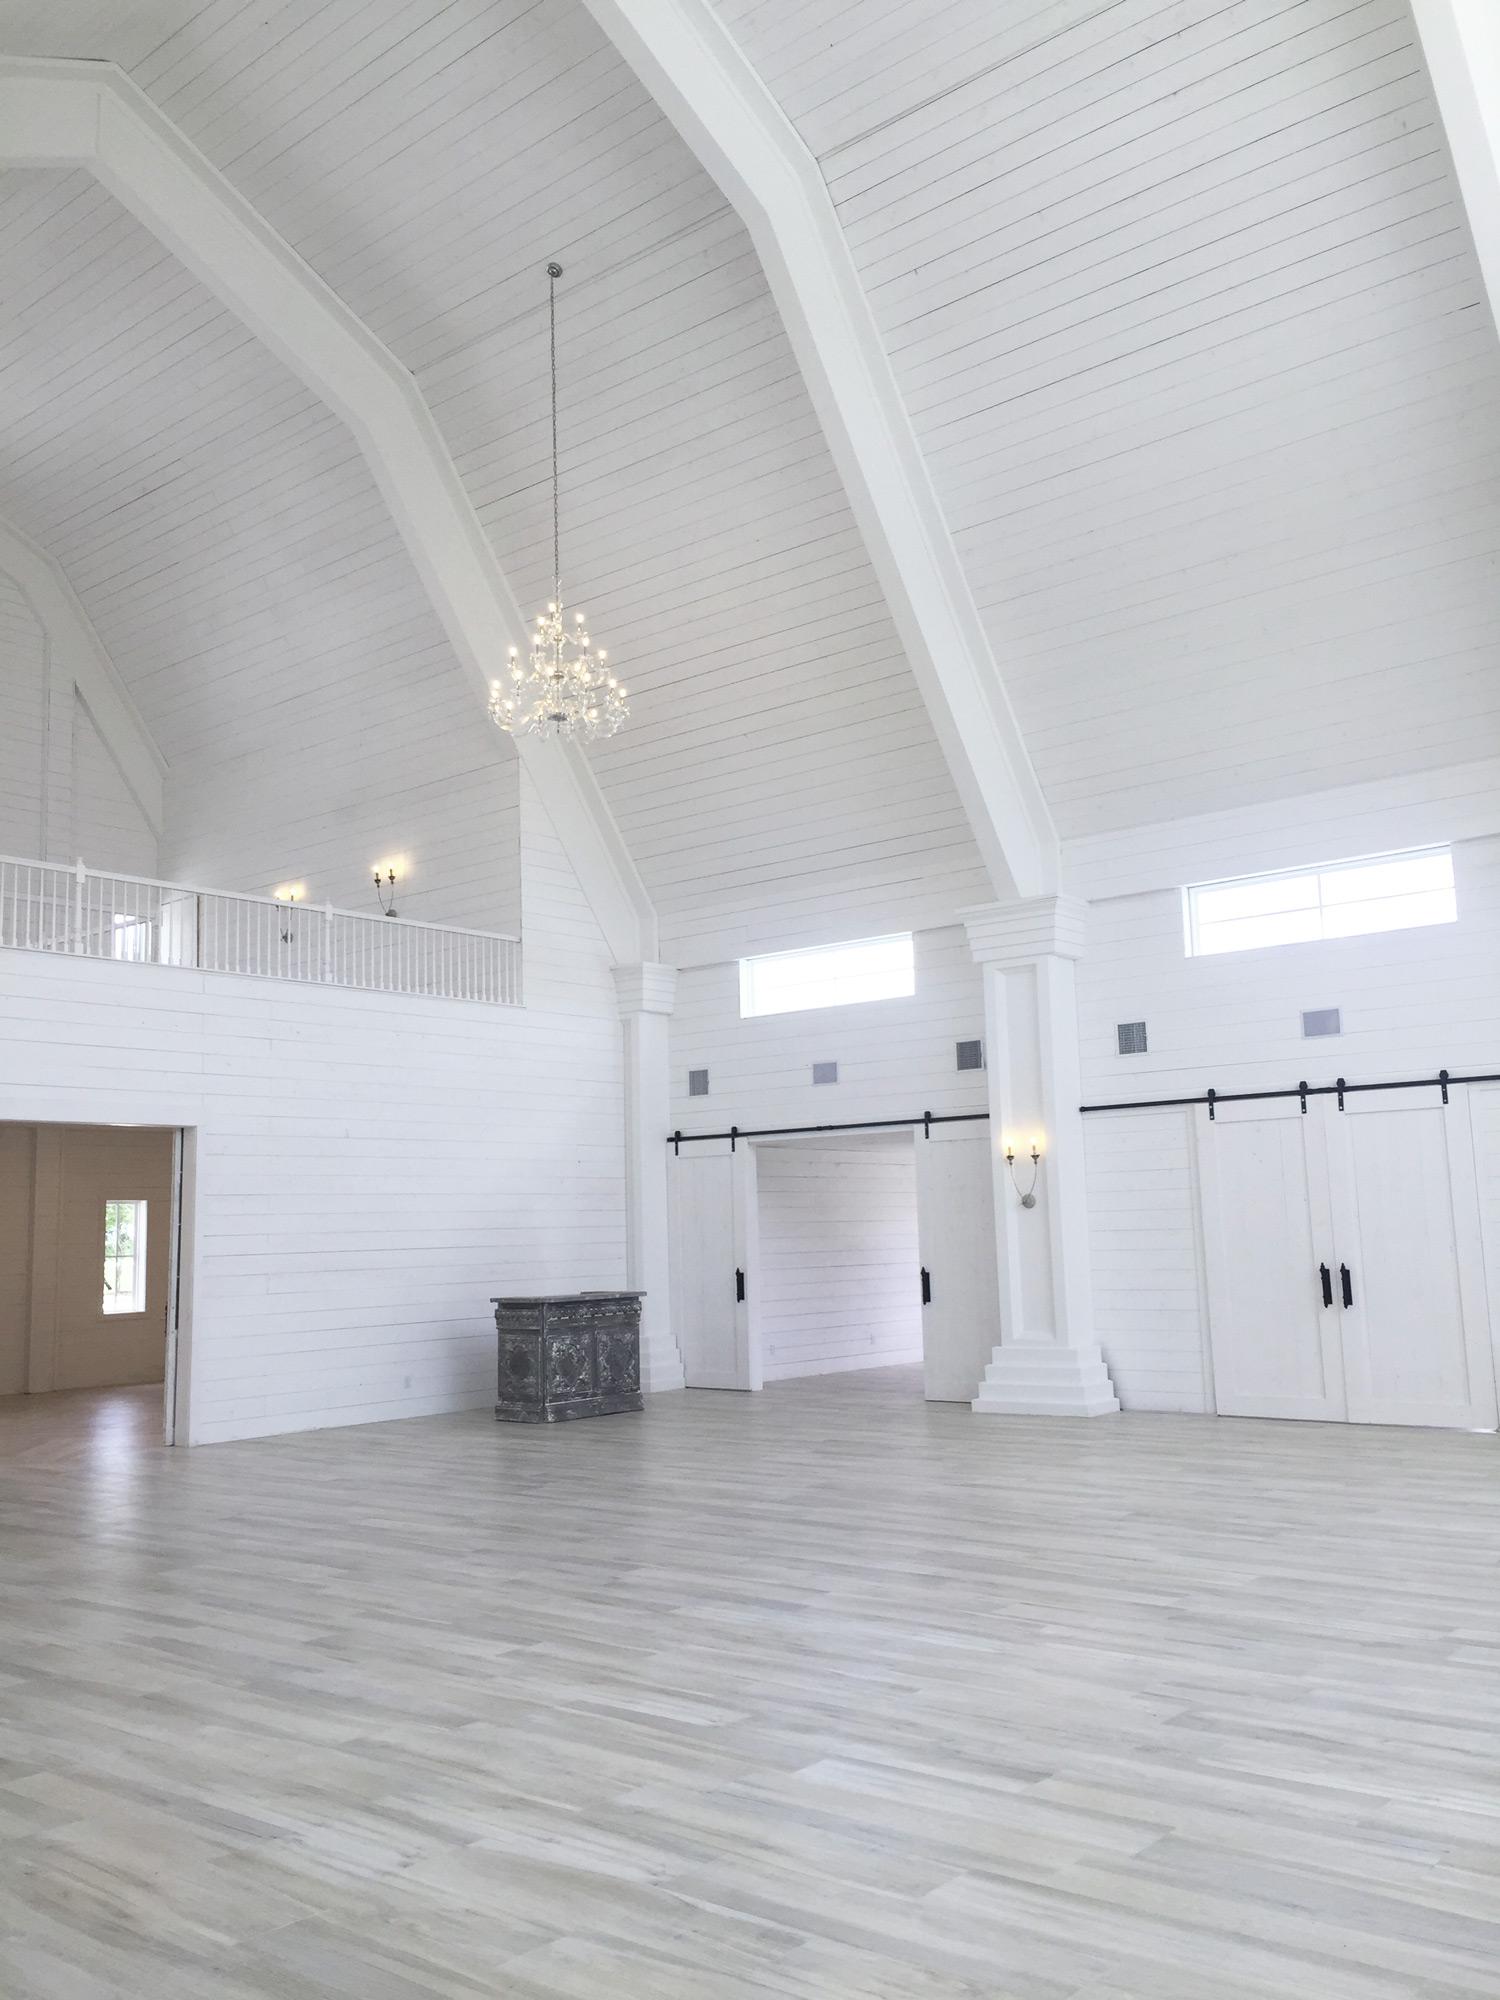 The Nest at Ruth Farms denton wedding venue's interior barn doors